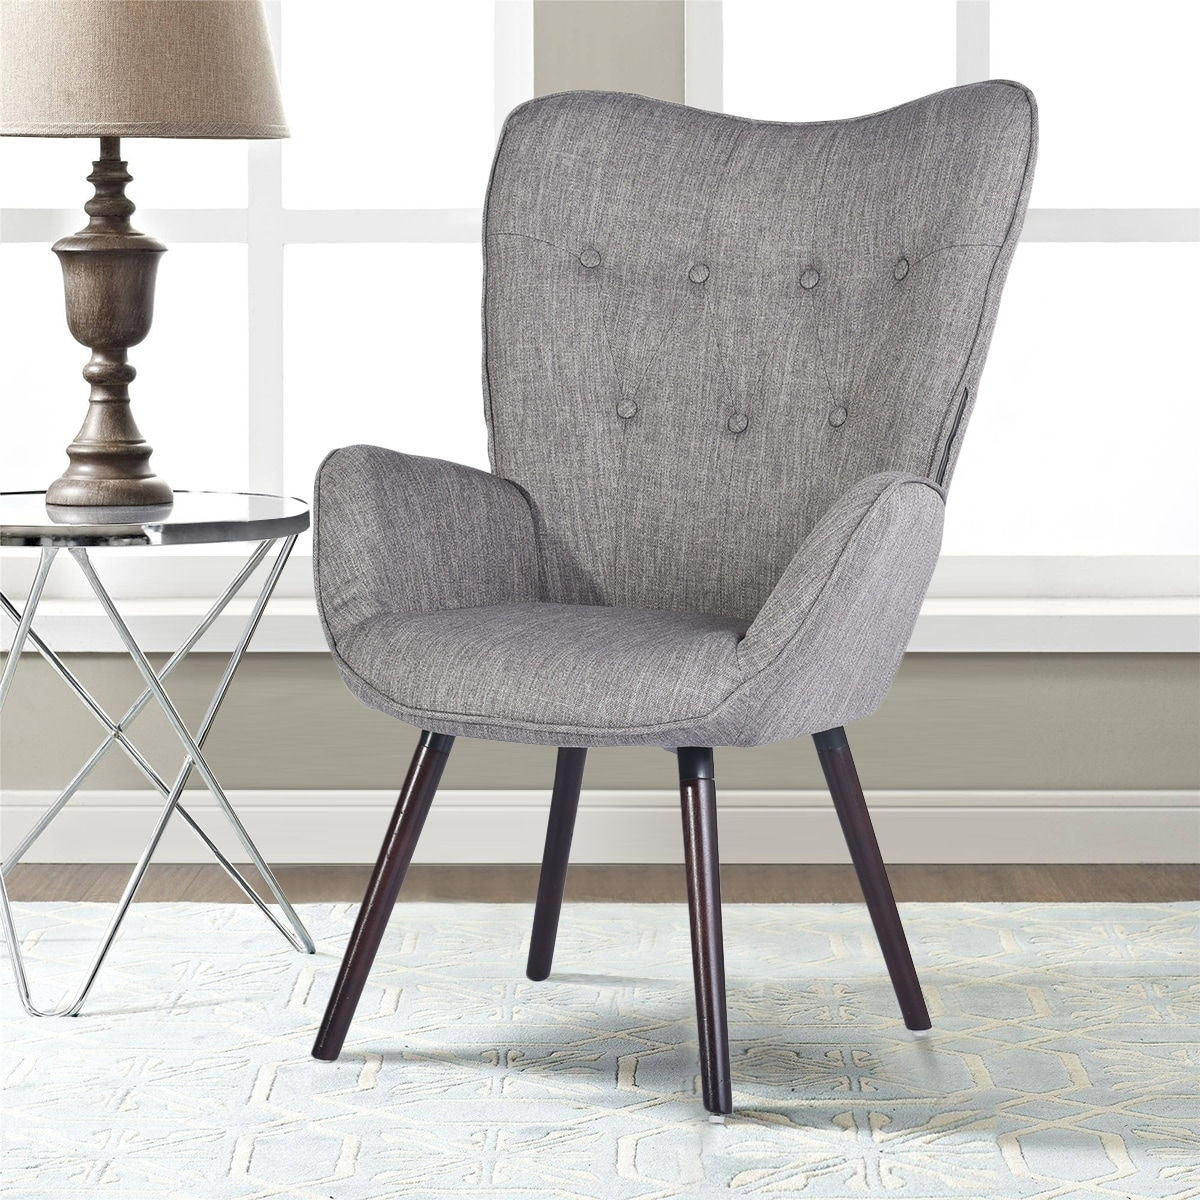 Phenomenal Carson Carrington Falltorp Mid Century Modern Armchair Ocoug Best Dining Table And Chair Ideas Images Ocougorg